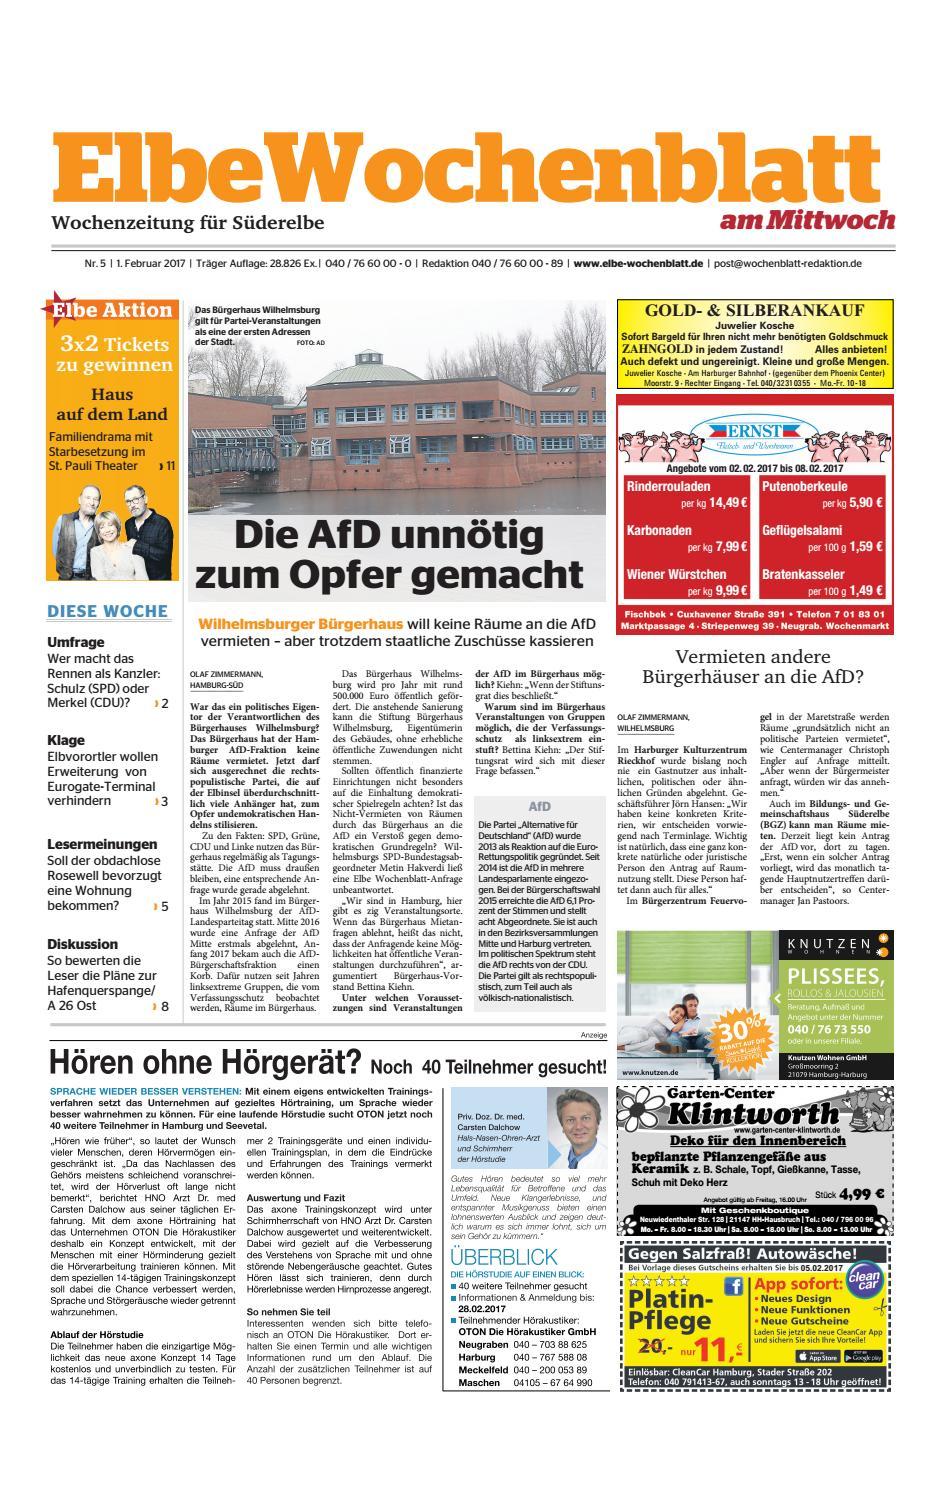 Suderelbe Kw05 2017 By Elbe Wochenblatt Verlagsgesellschaft Mbh Co